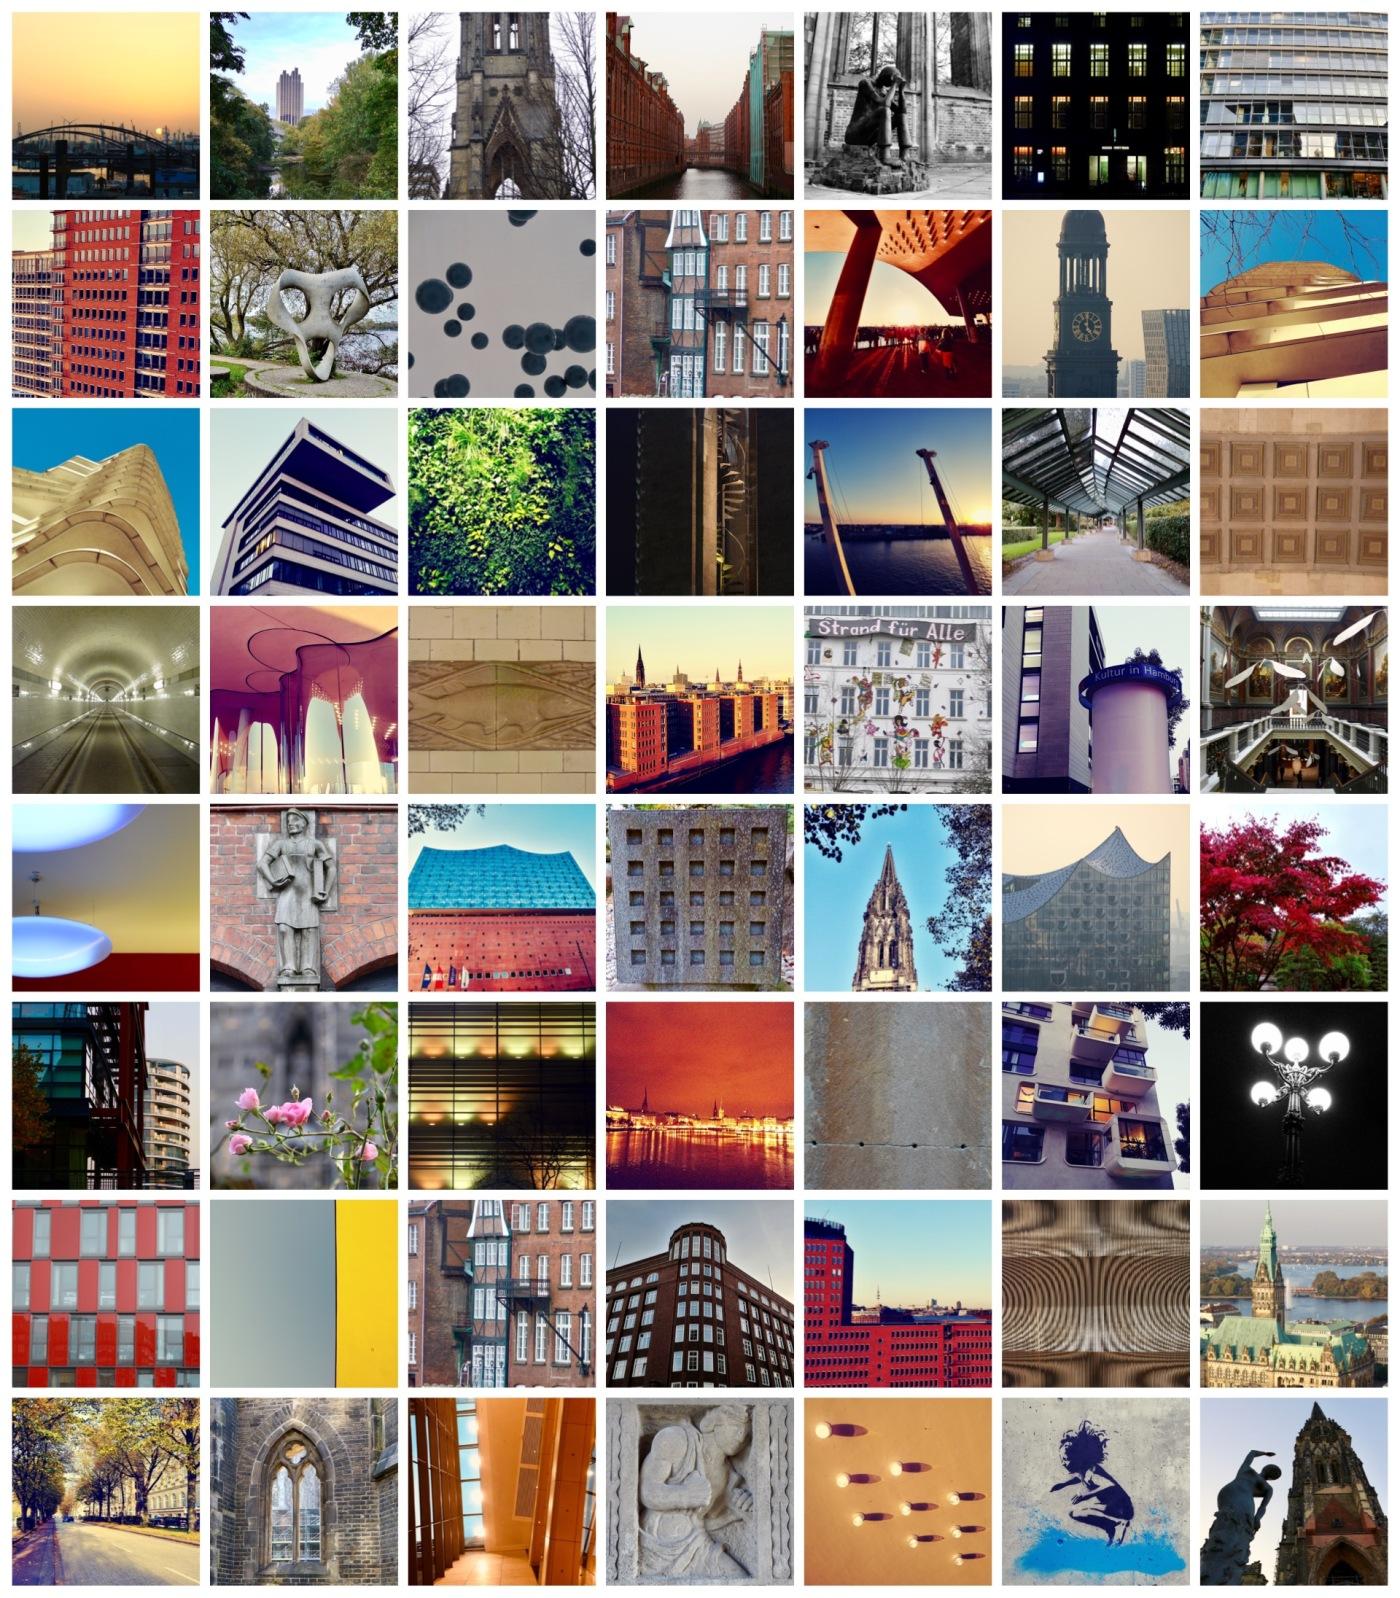 Awesome photos from Hamburg © KirstenKKester.com | Kirsten K. Kester